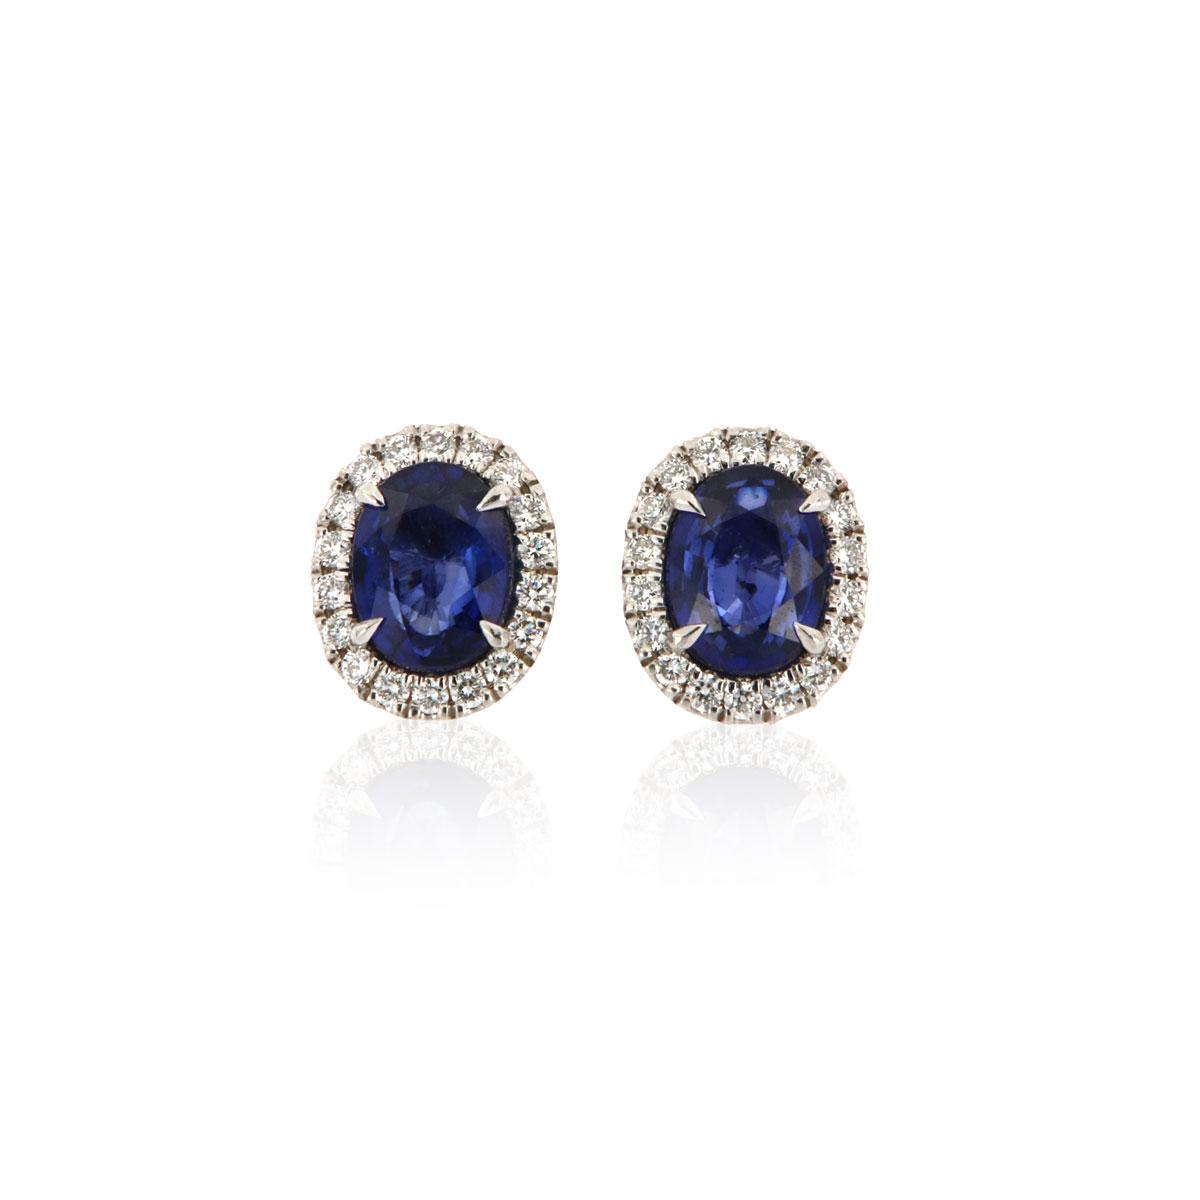 14k white gold Oval Blue Sapphire & Diamonds Halo Earrings ( 3 ct. tw))